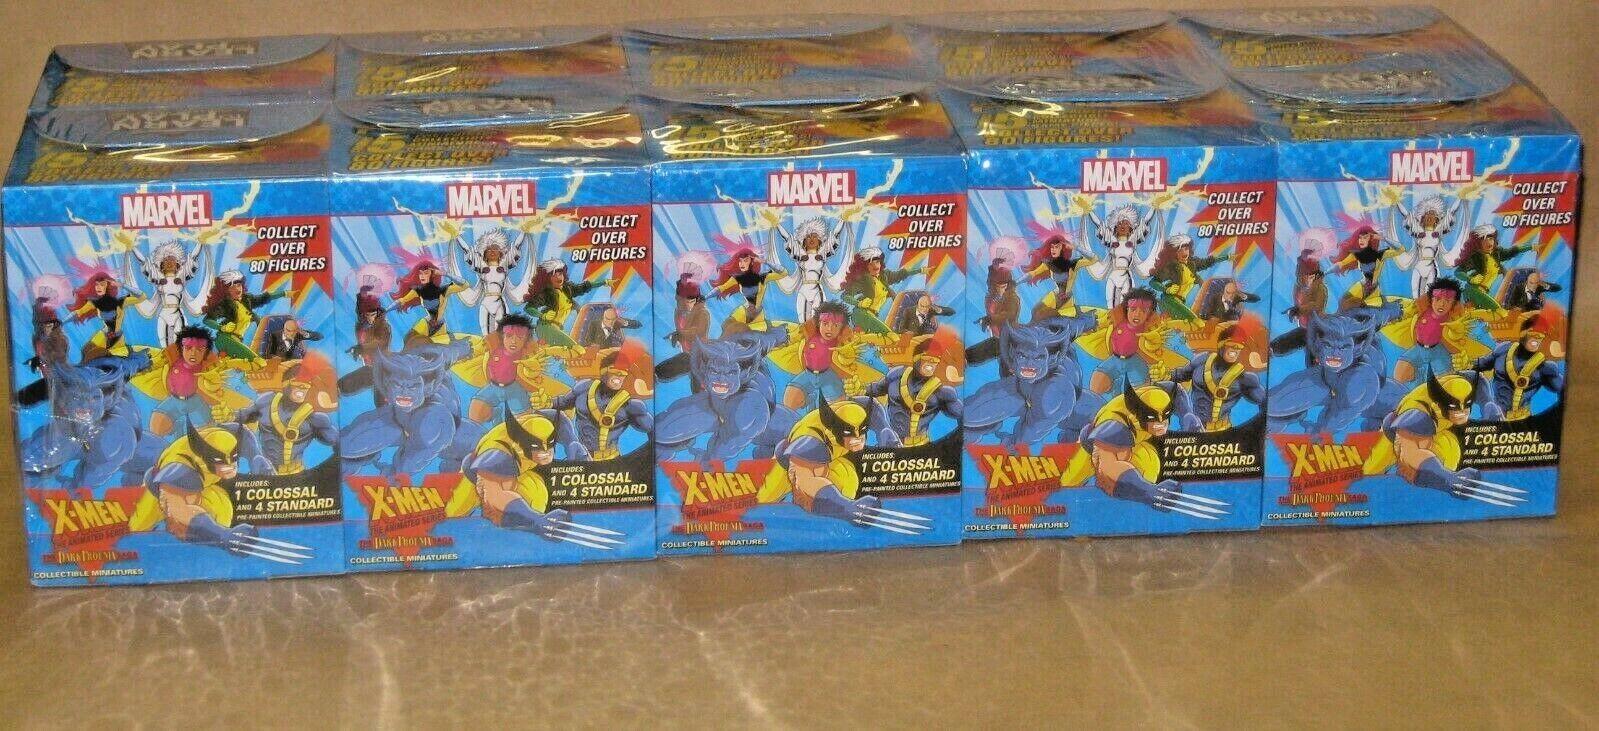 14600 Marvel HeroClix – X-Men  the Animated Series, the Dark Phoenix Saga